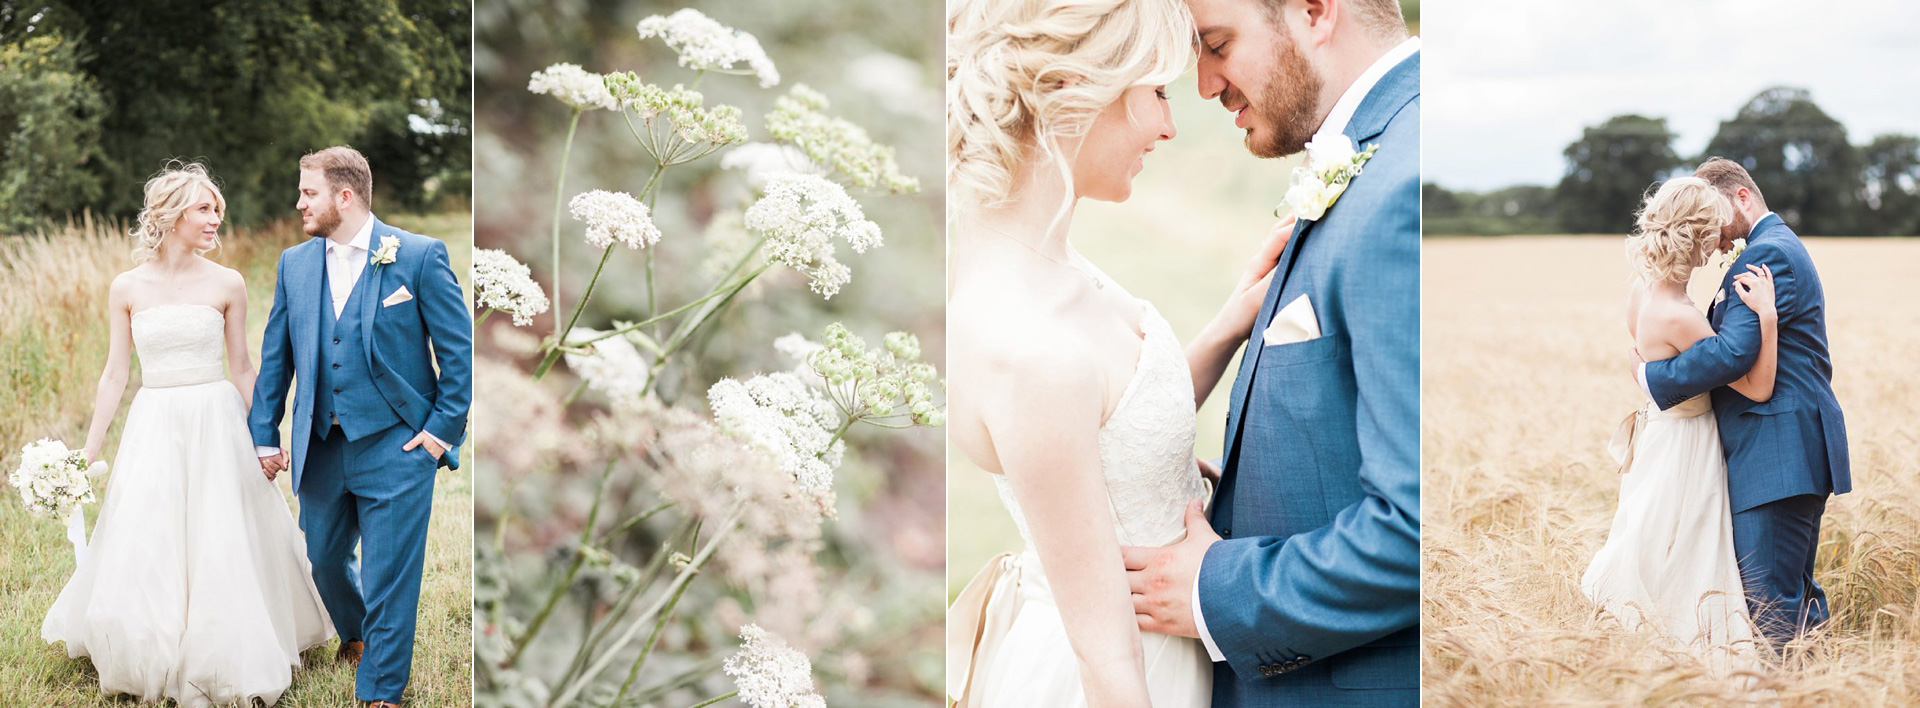 Luxury-Wedding-Photography-by-Fine-Art-Wedding-Photography-Lilybean-Photography-07